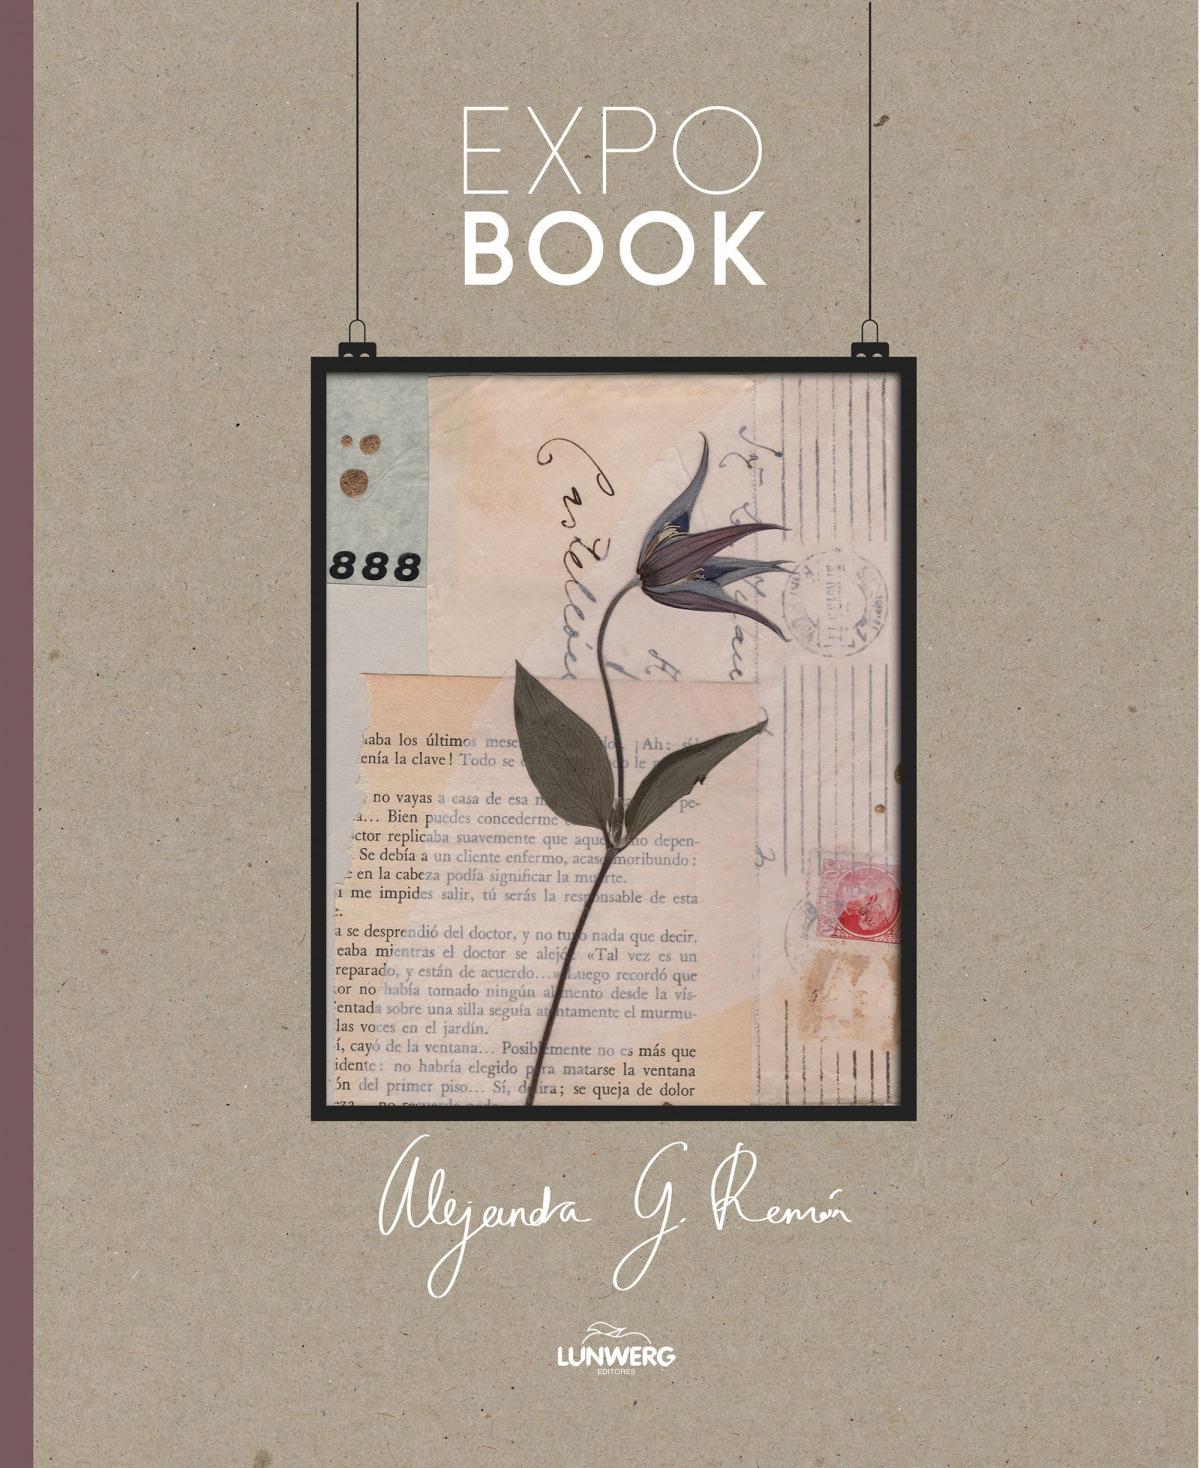 Expo book. Alejandra G. Remón